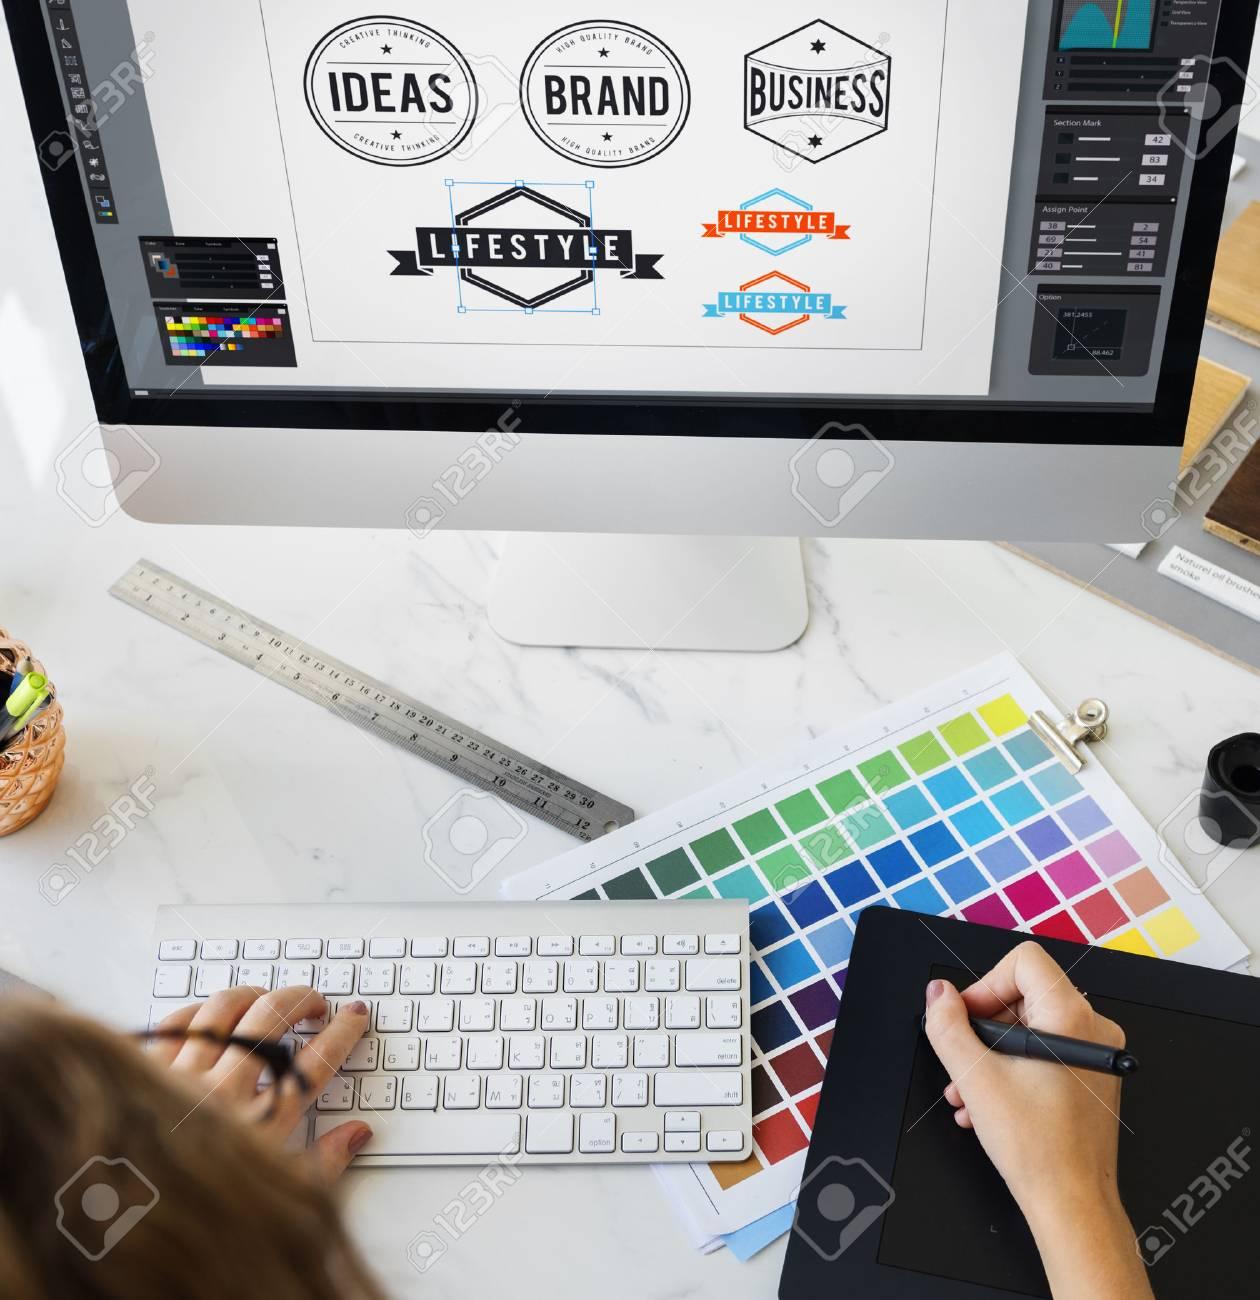 Ideas Creative Occupation Design Studio Drawing Startup Concept - 63710407